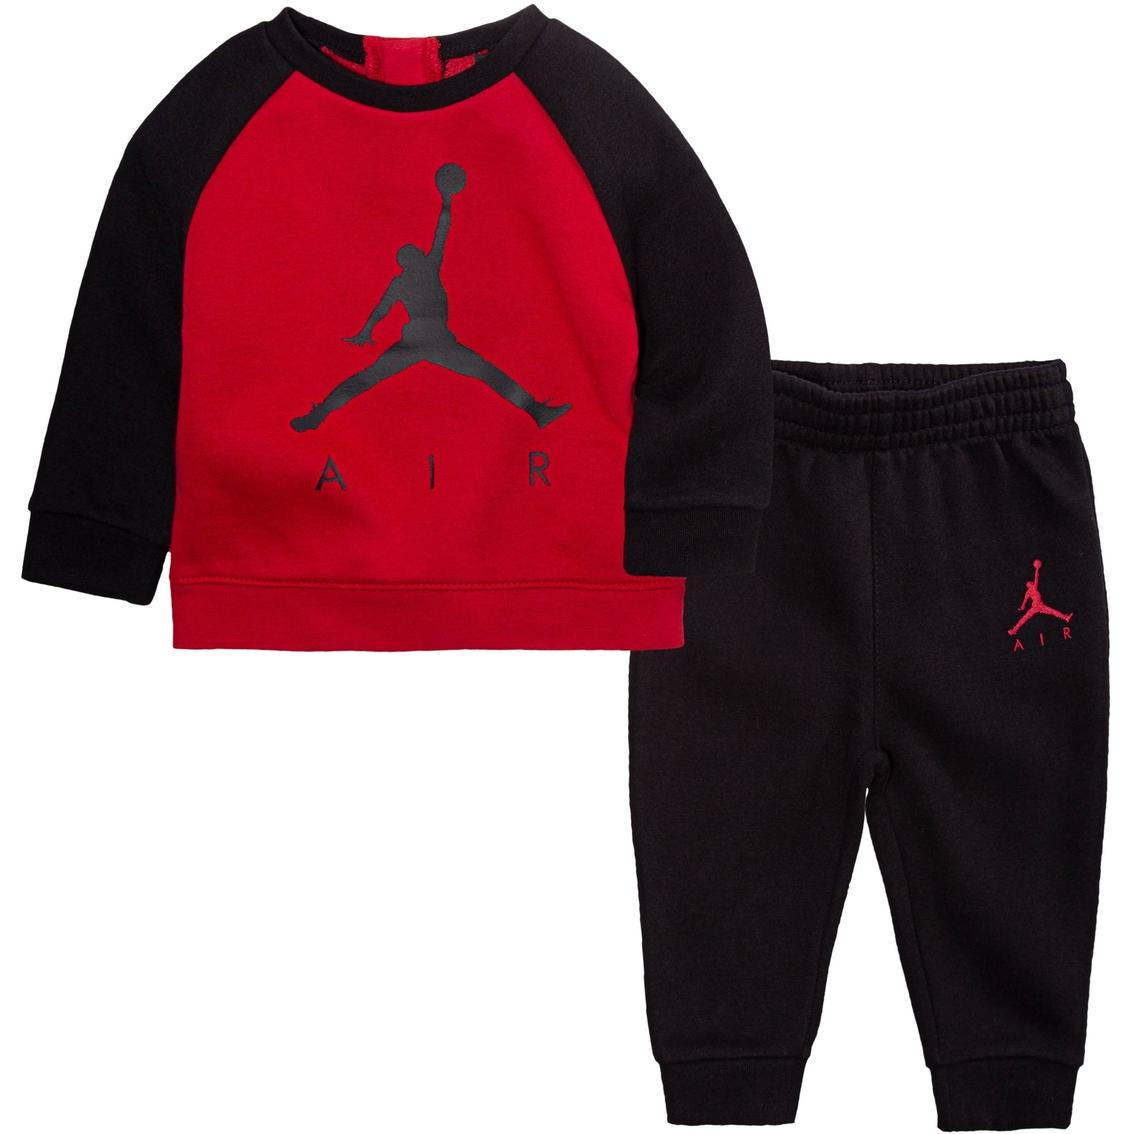 promo code e526f f8bde Jordan Infant Boys Air Jordan Crew Top And Pants Set | Baby ...